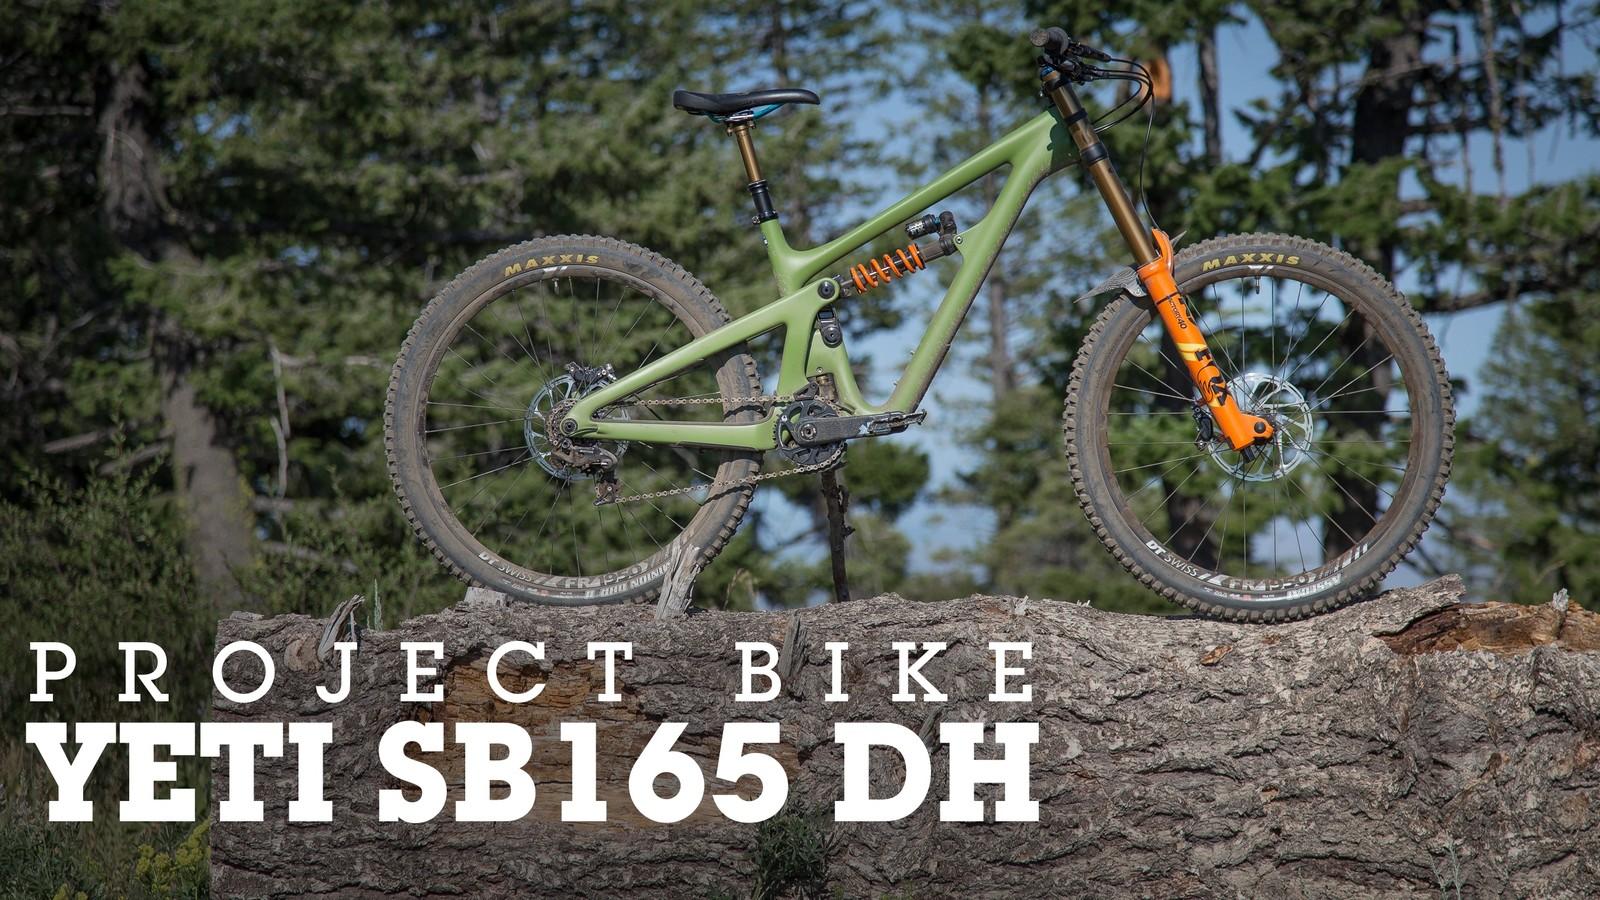 The Ultimate Park Bike? Vital's Yeti SB165 Project